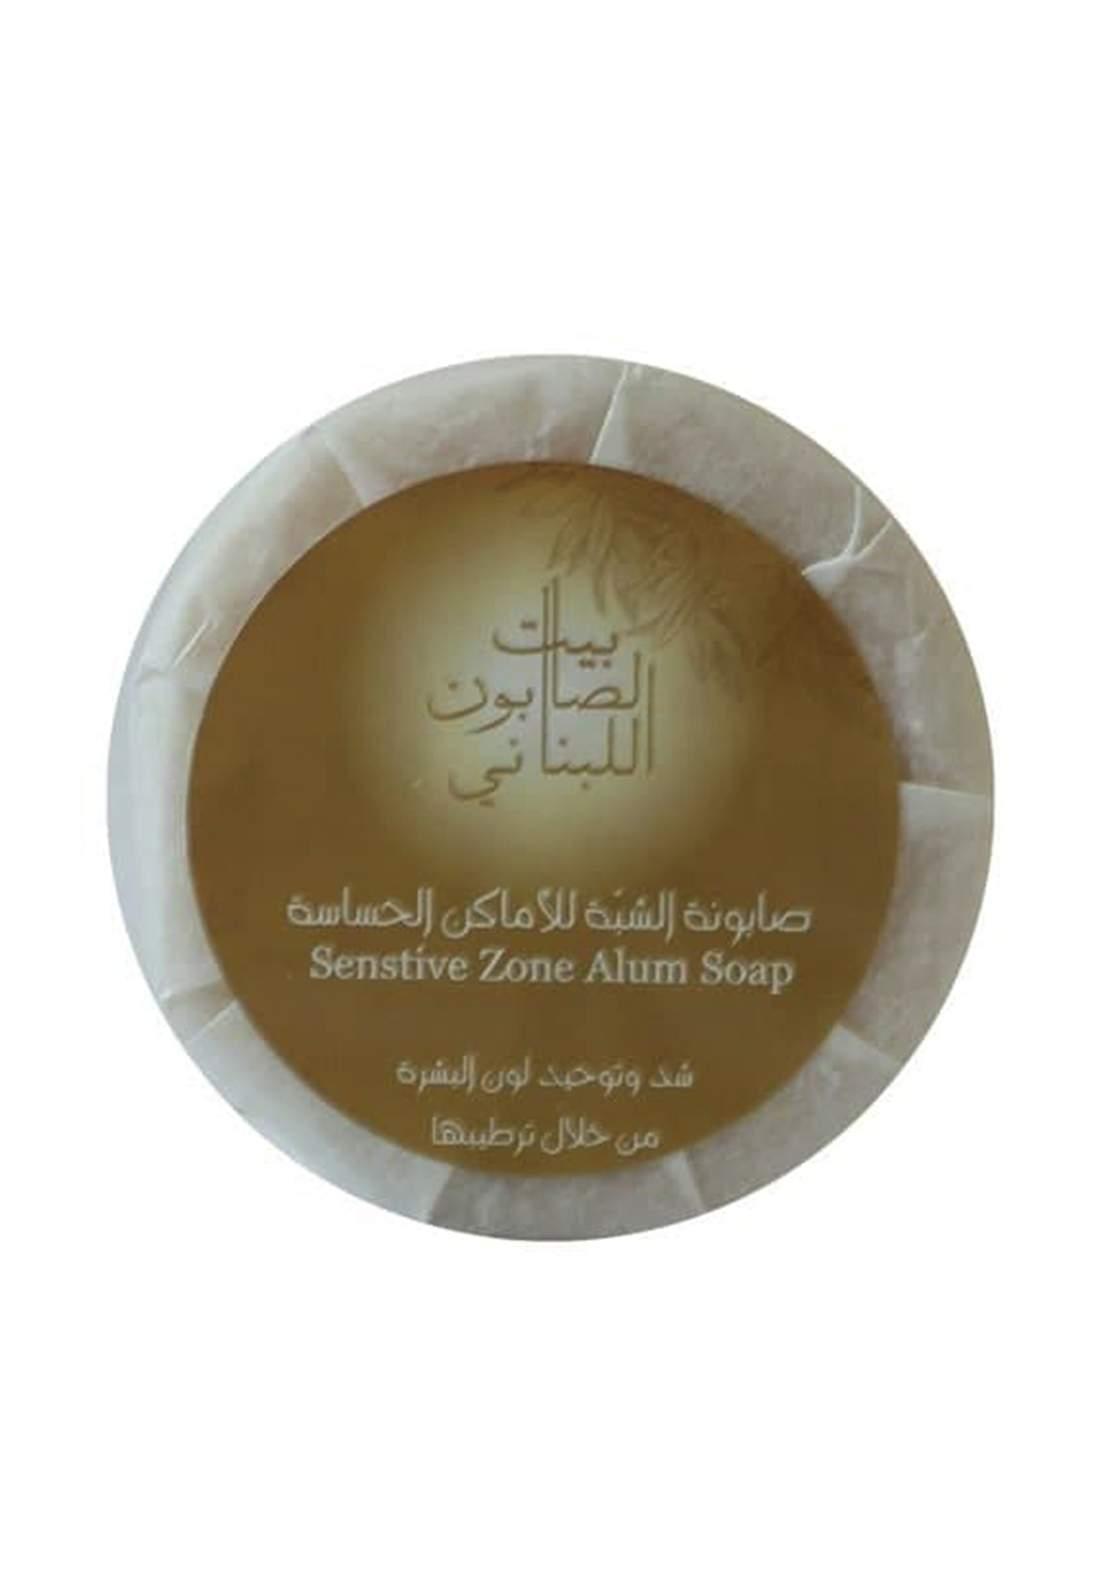 Bayt Alsaboun Alloubnani-317458 Senstive Zone Alum Soap 3*50g صابون